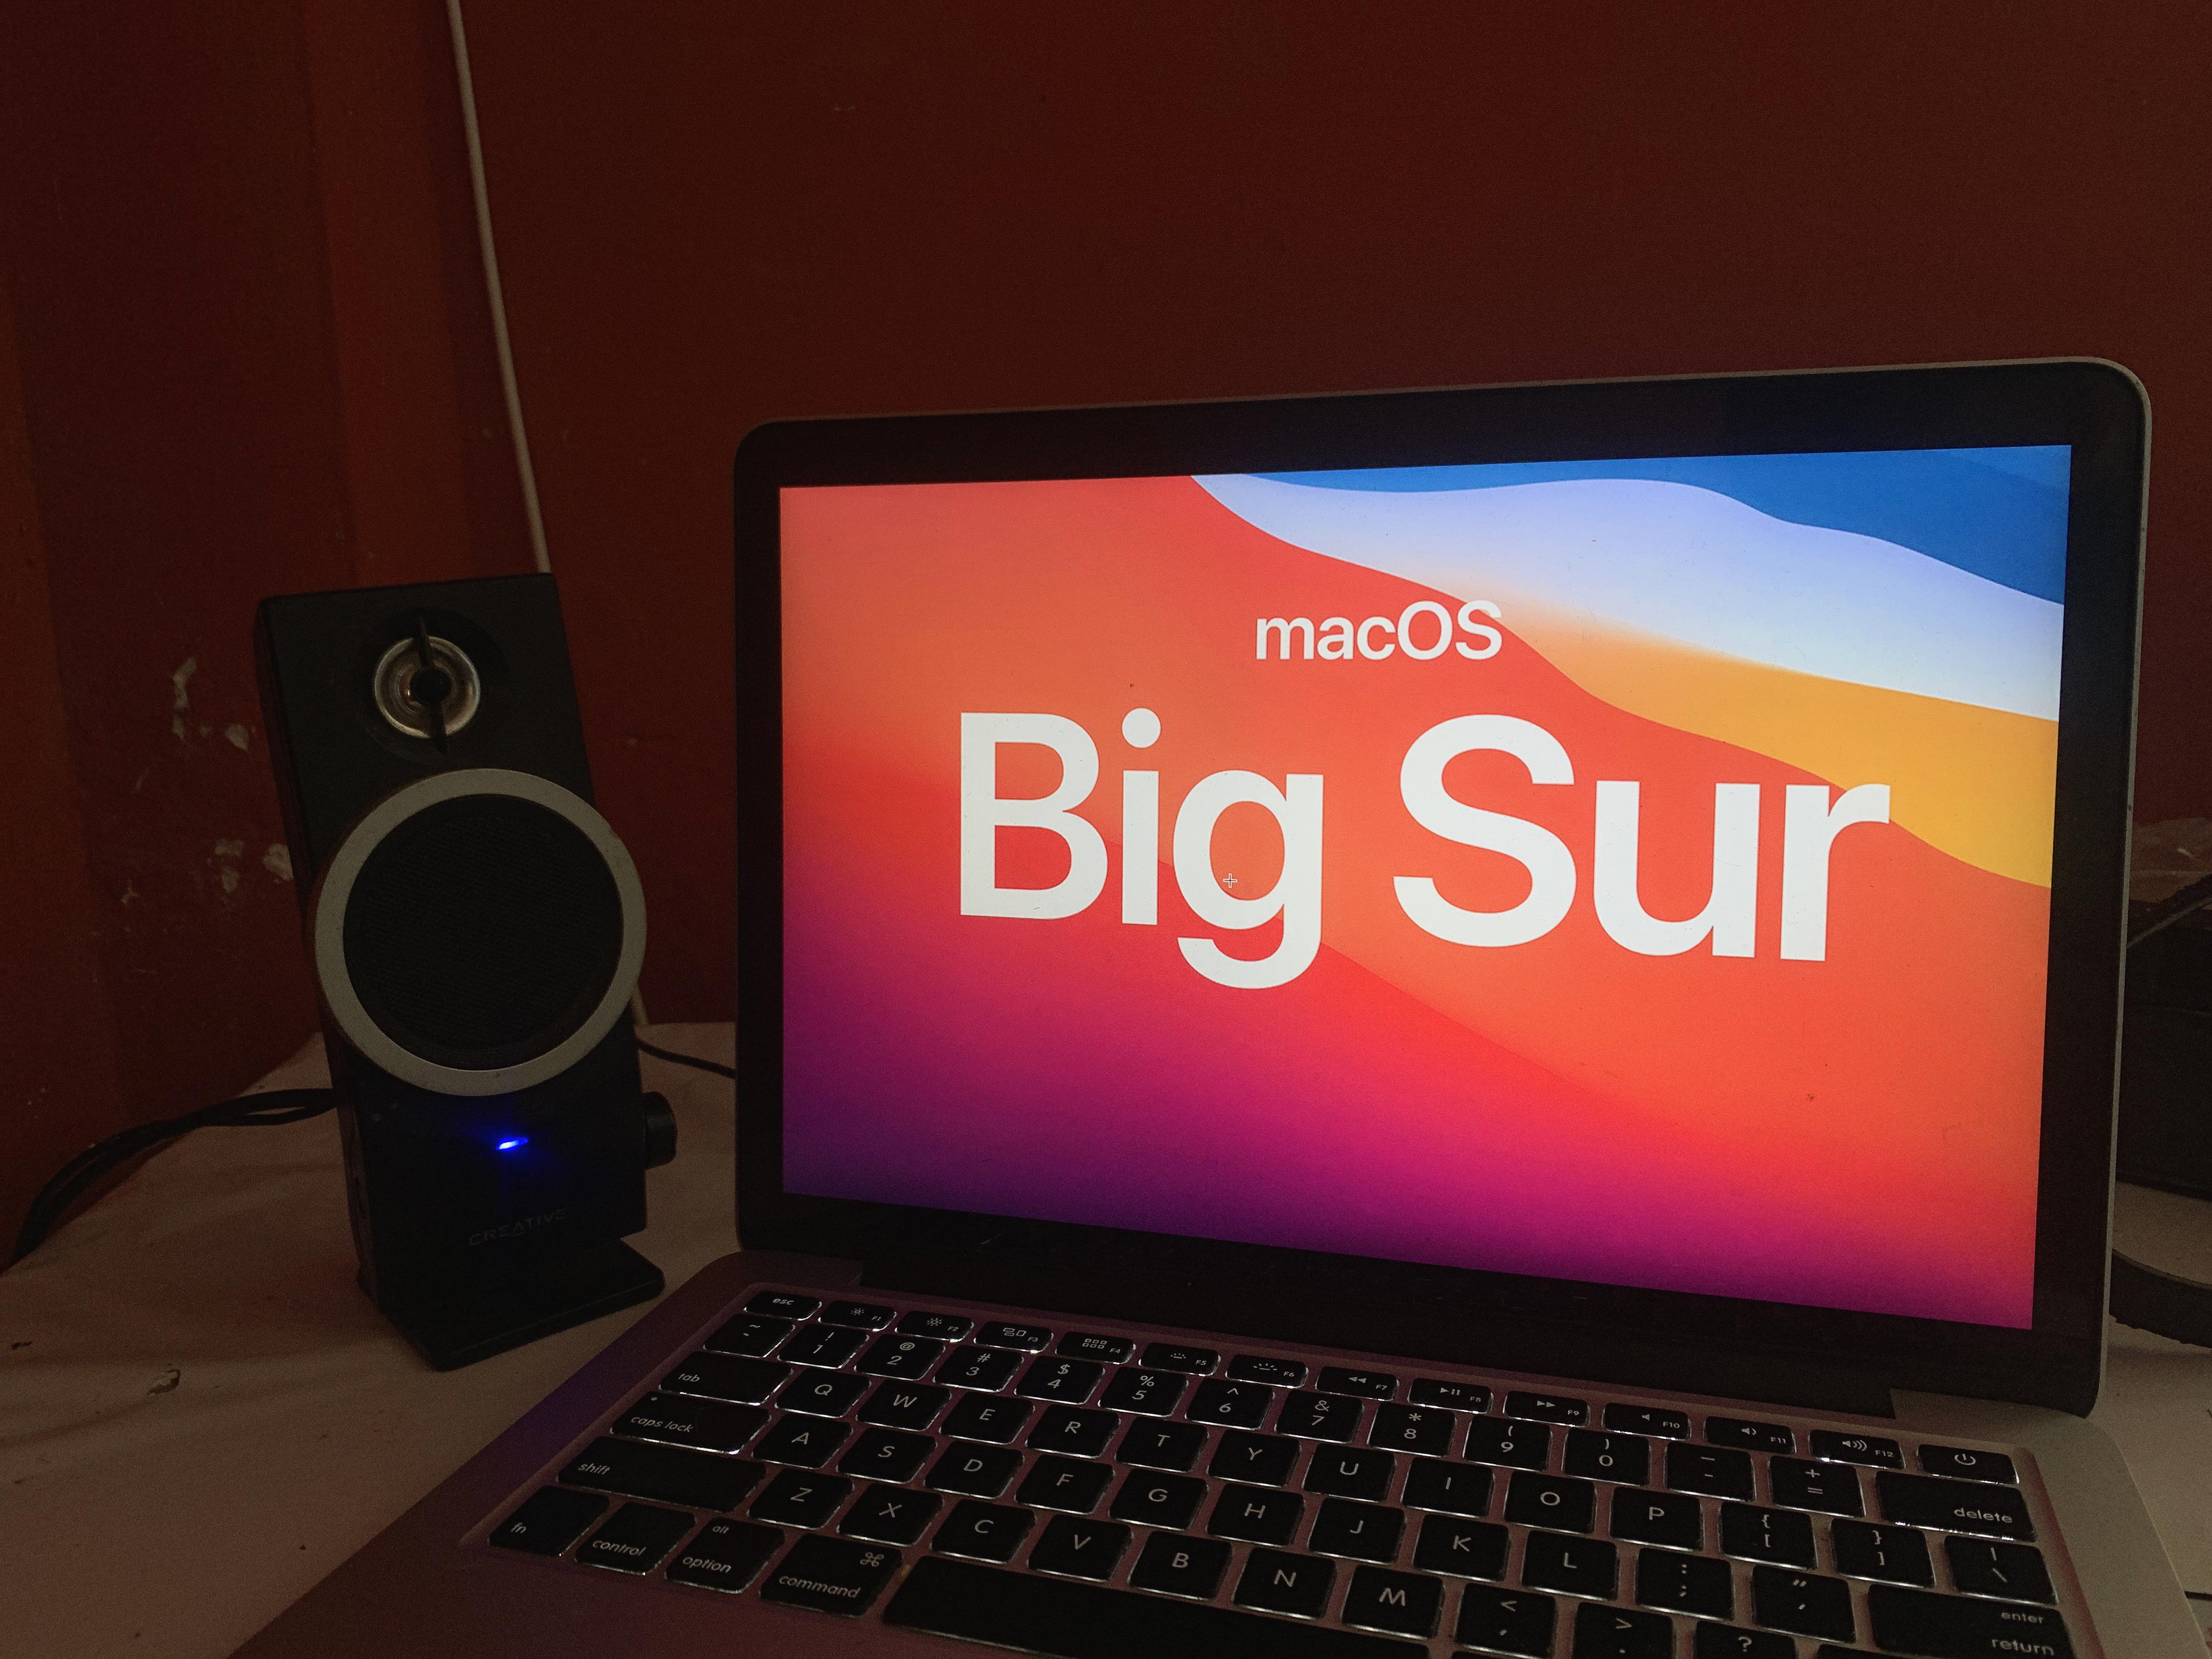 Apple's Big Sur: What Does it Offer?